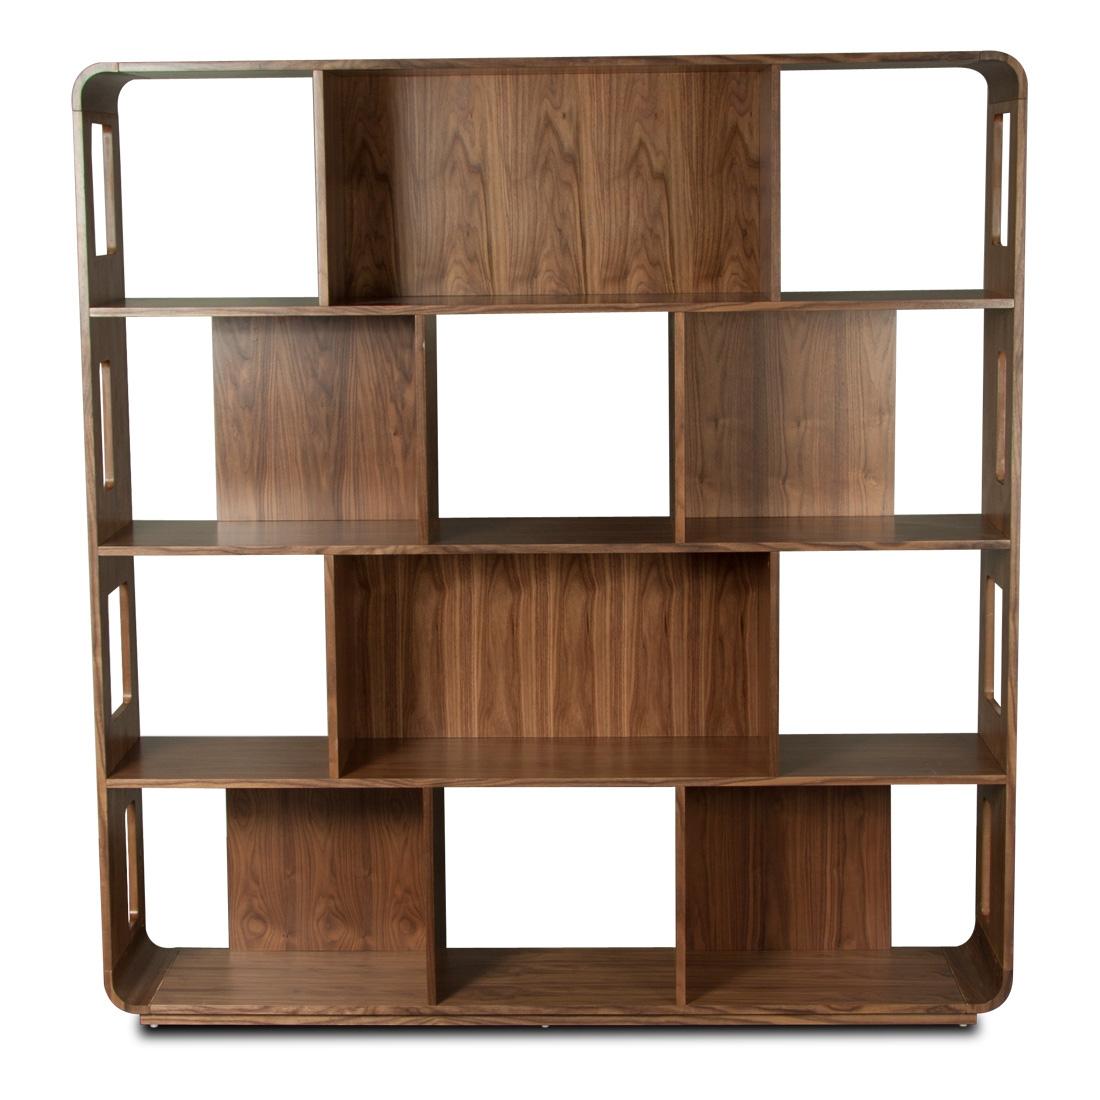 Astounding Black Shelving System Design For Living Room Interior For Wooden Shelving Units (View 12 of 15)